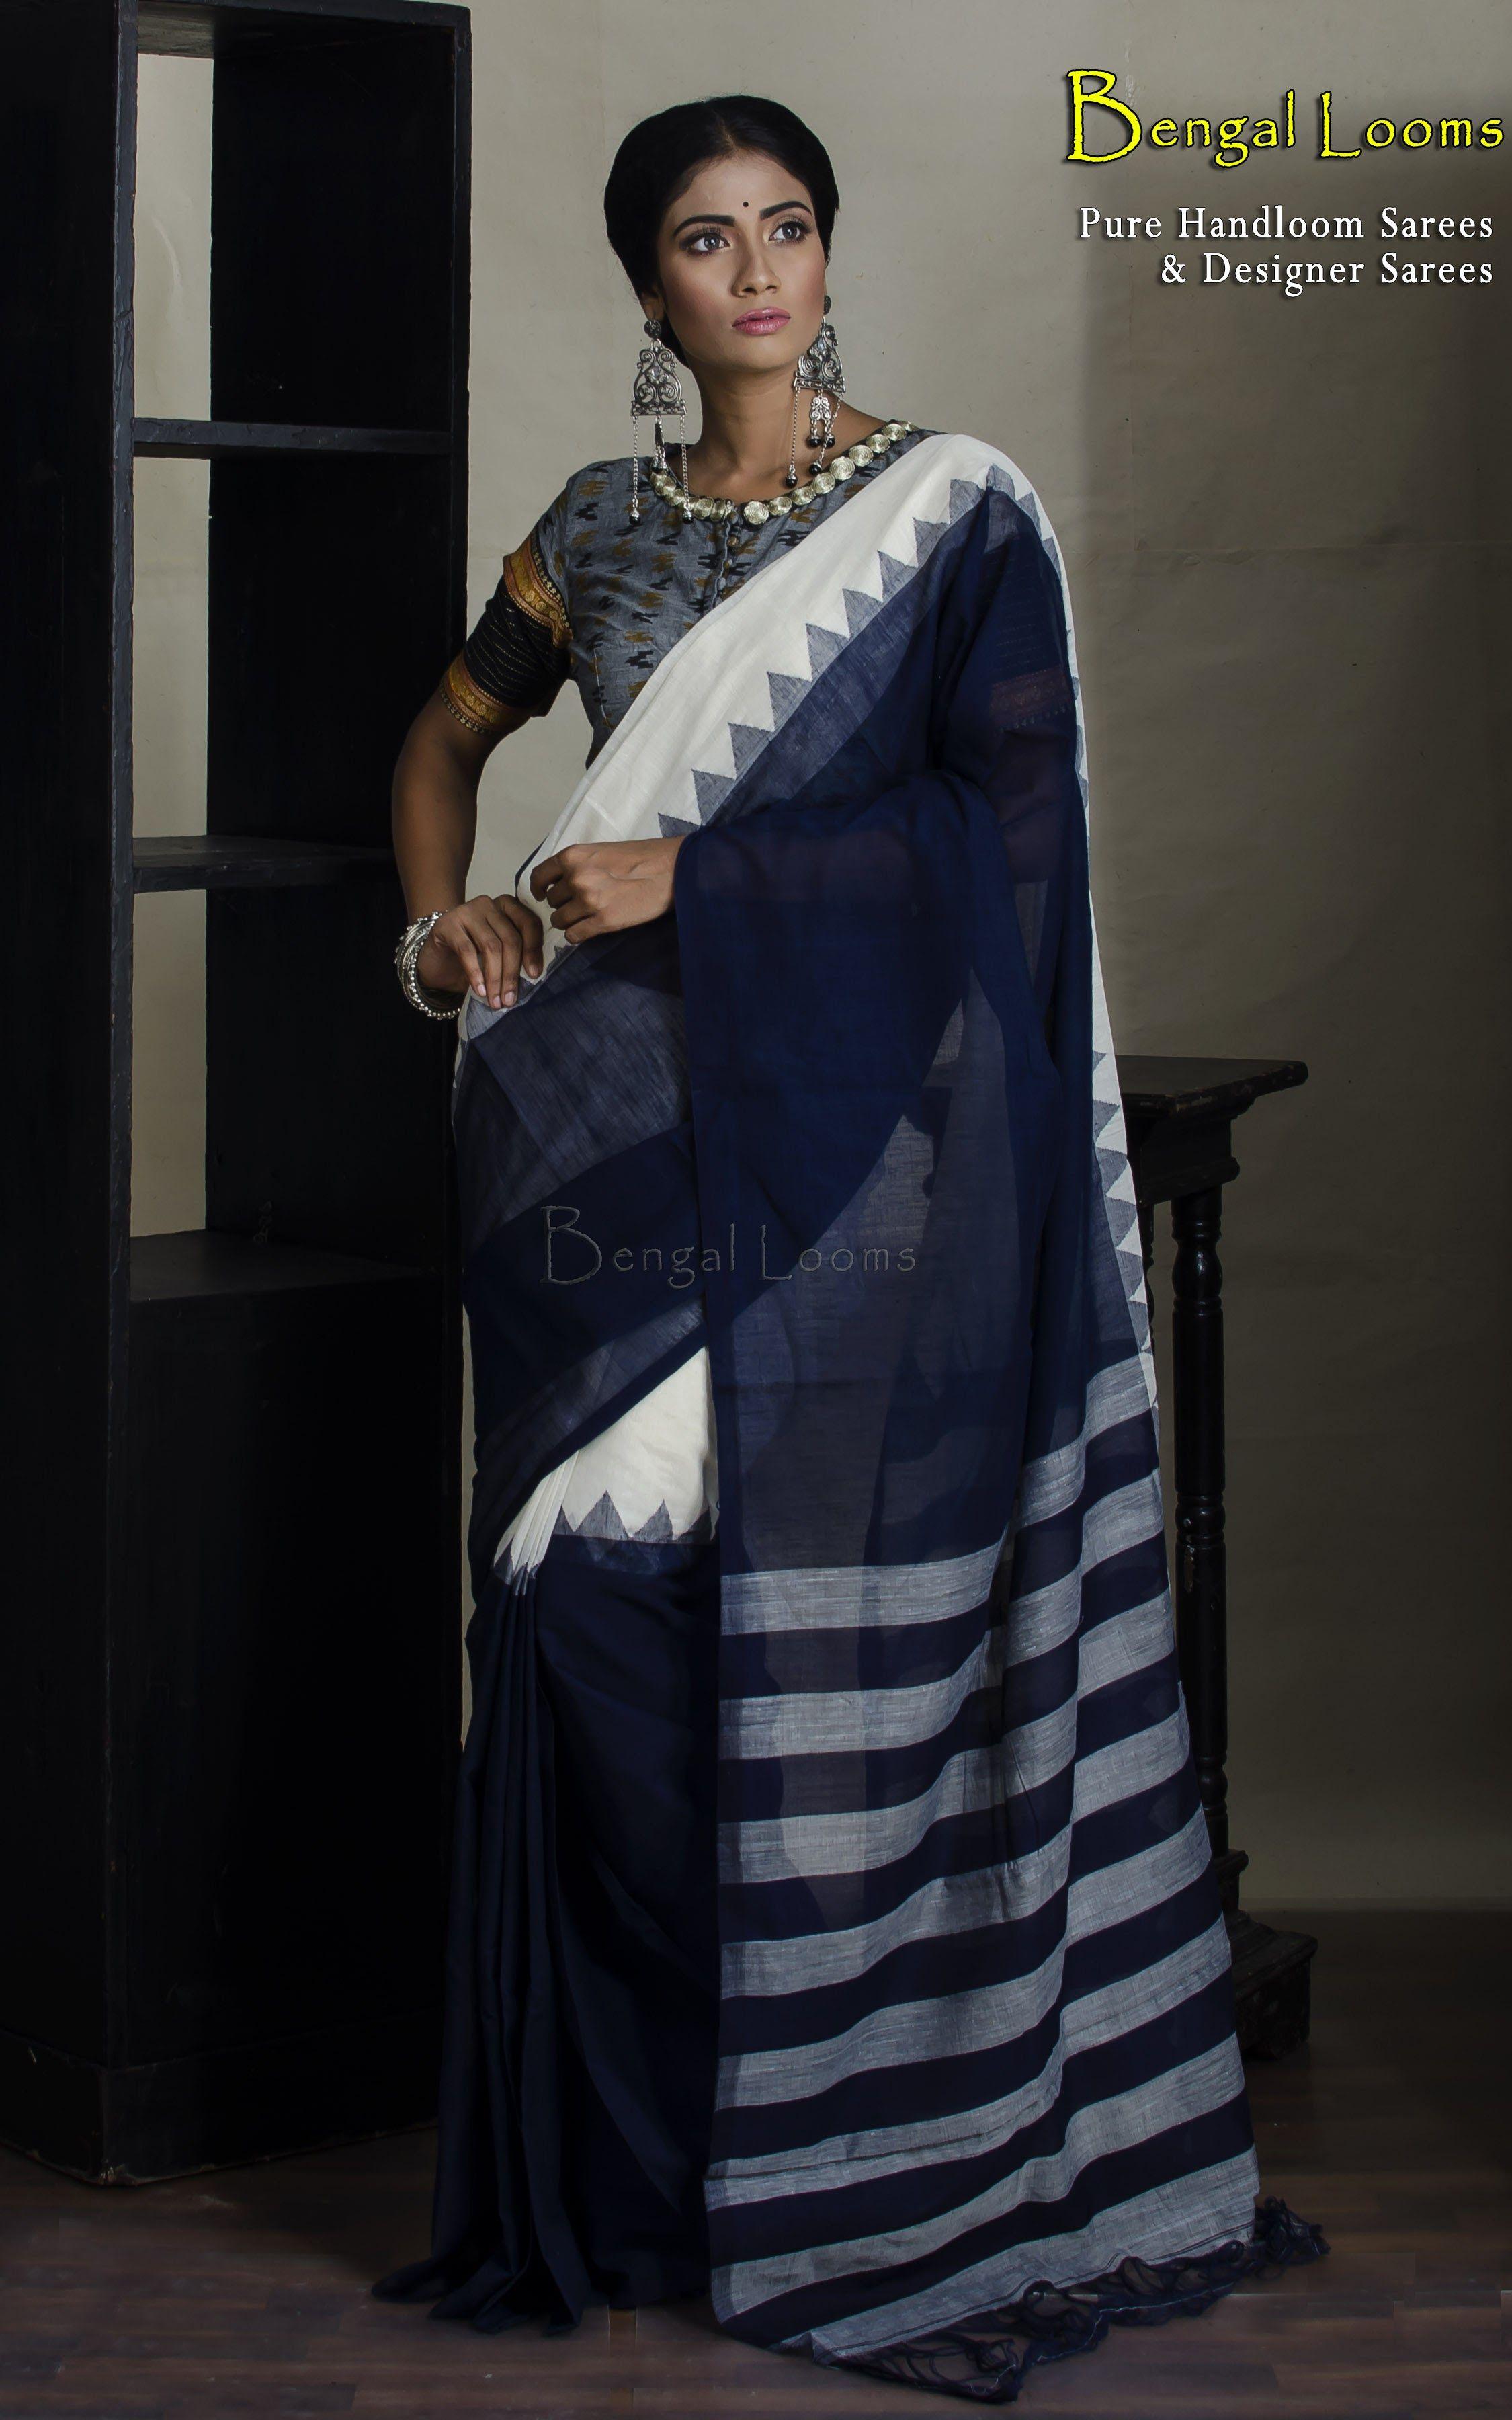 Pin By Sonia Chhabra On Sarees In 2020 Khadi Saree Cotton Saree Handloom Saree